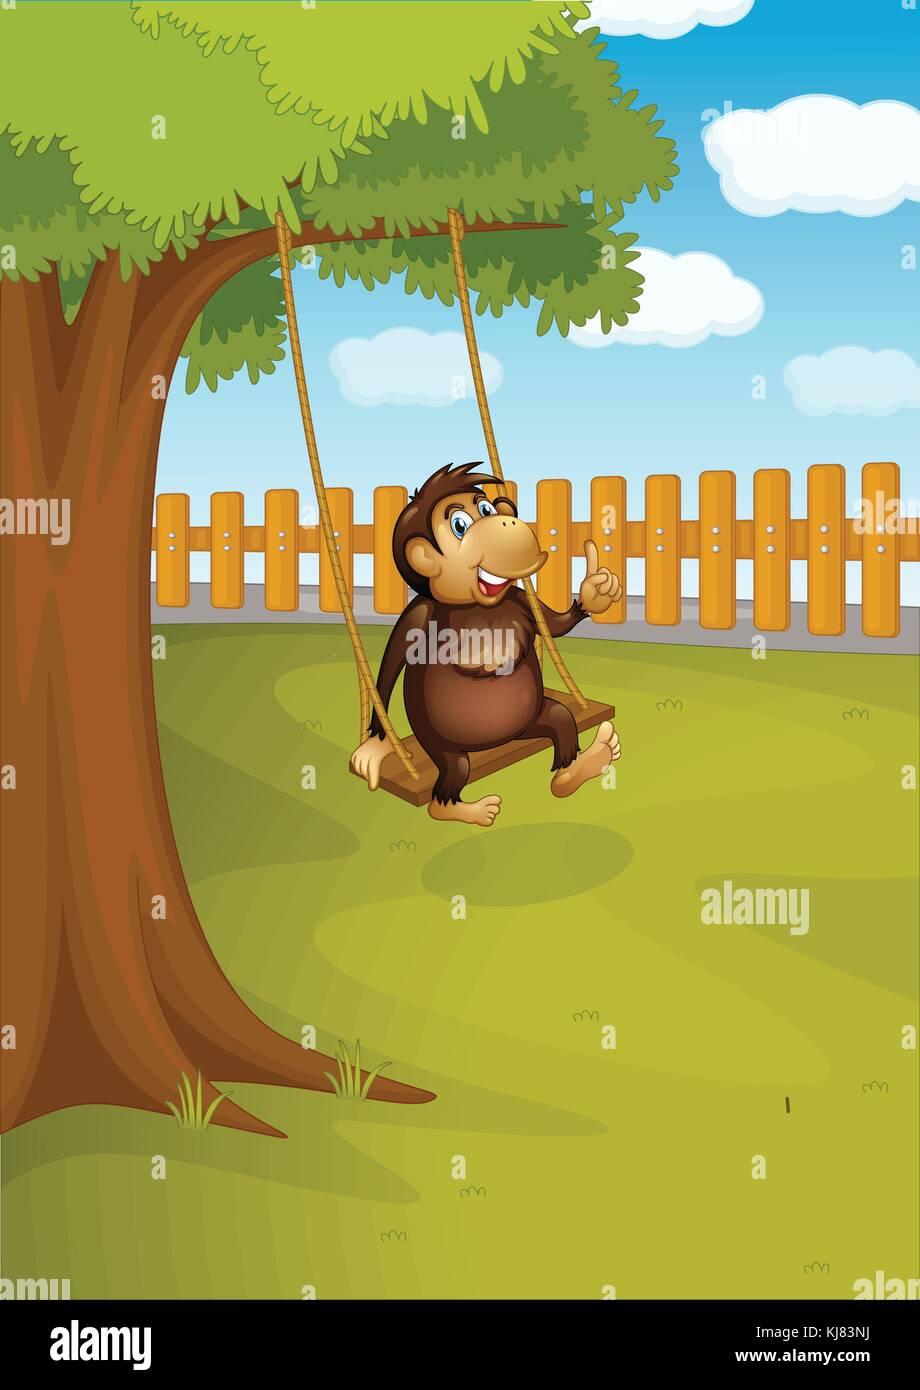 Illustration Of A Monkey Swinging On A Tree Stock Vector Art